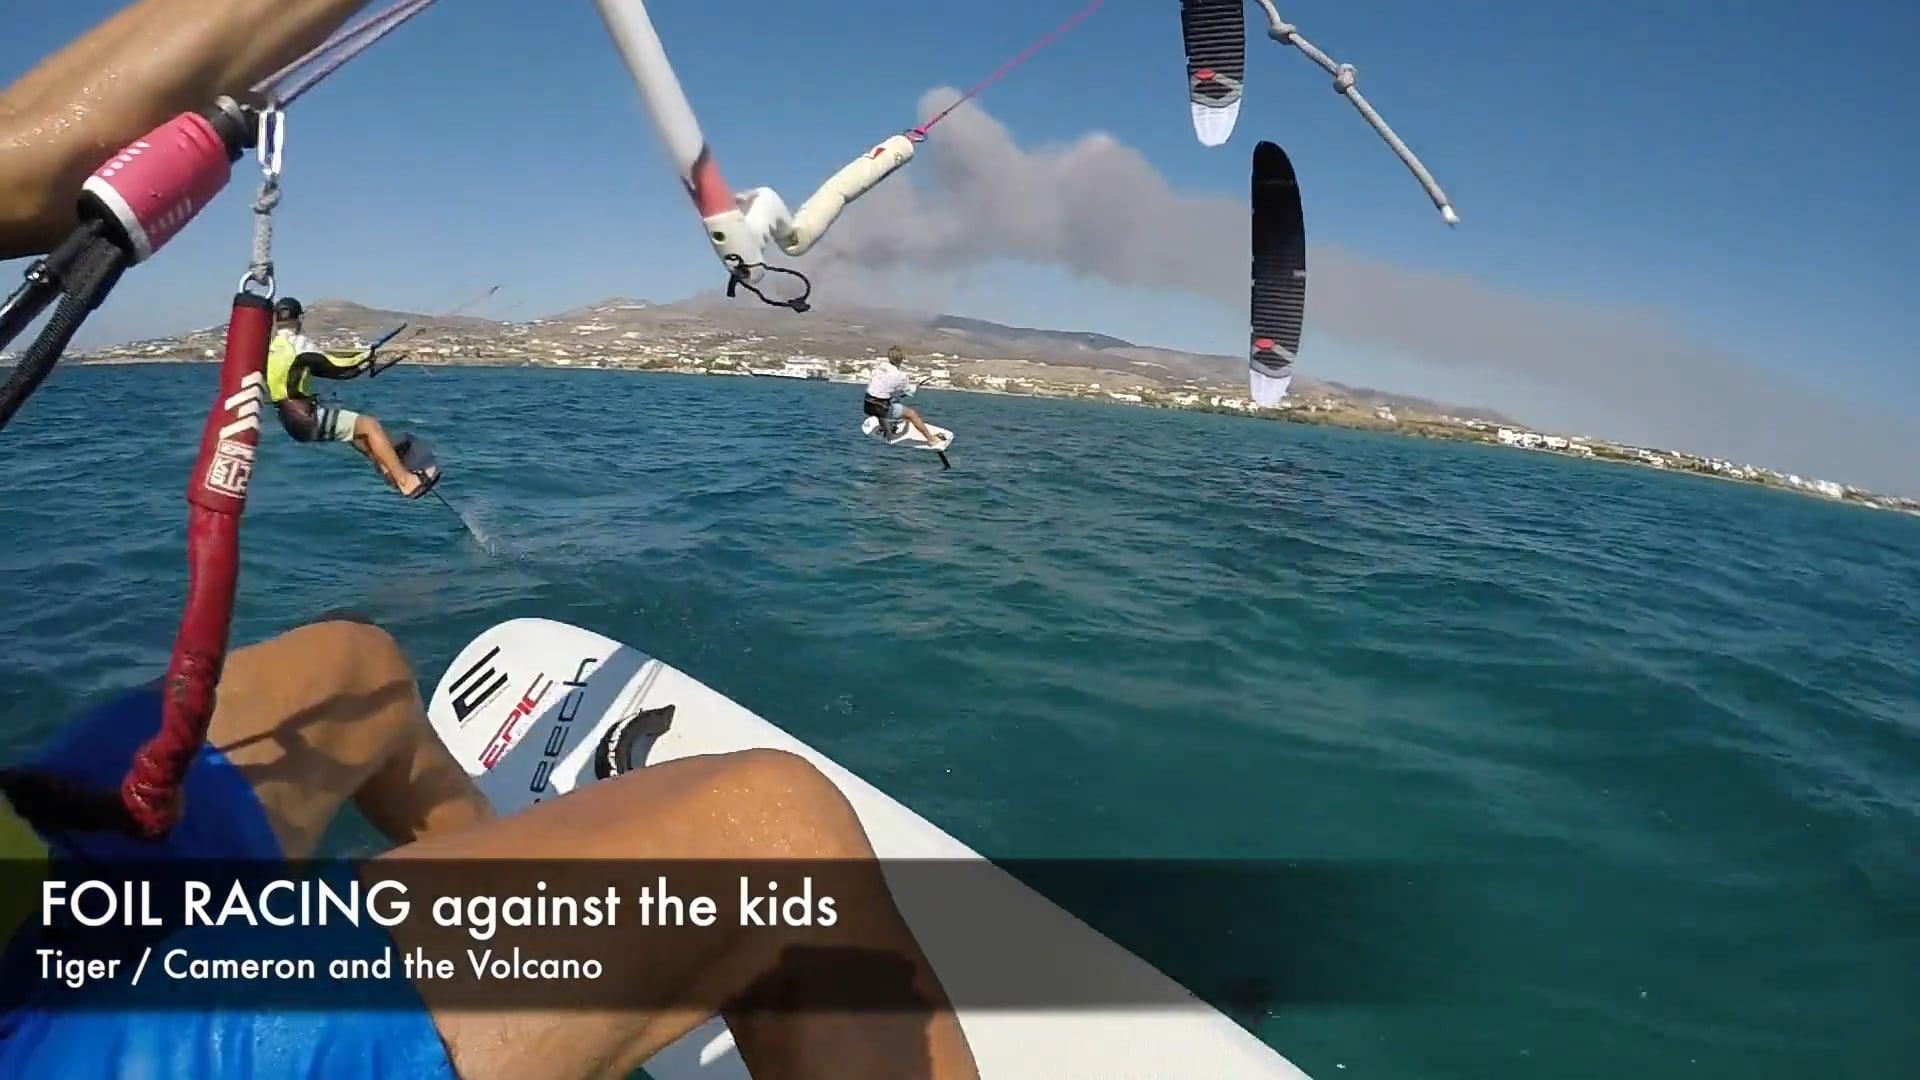 Foil jibing gone bad - with Epic Kites Kiteboarding